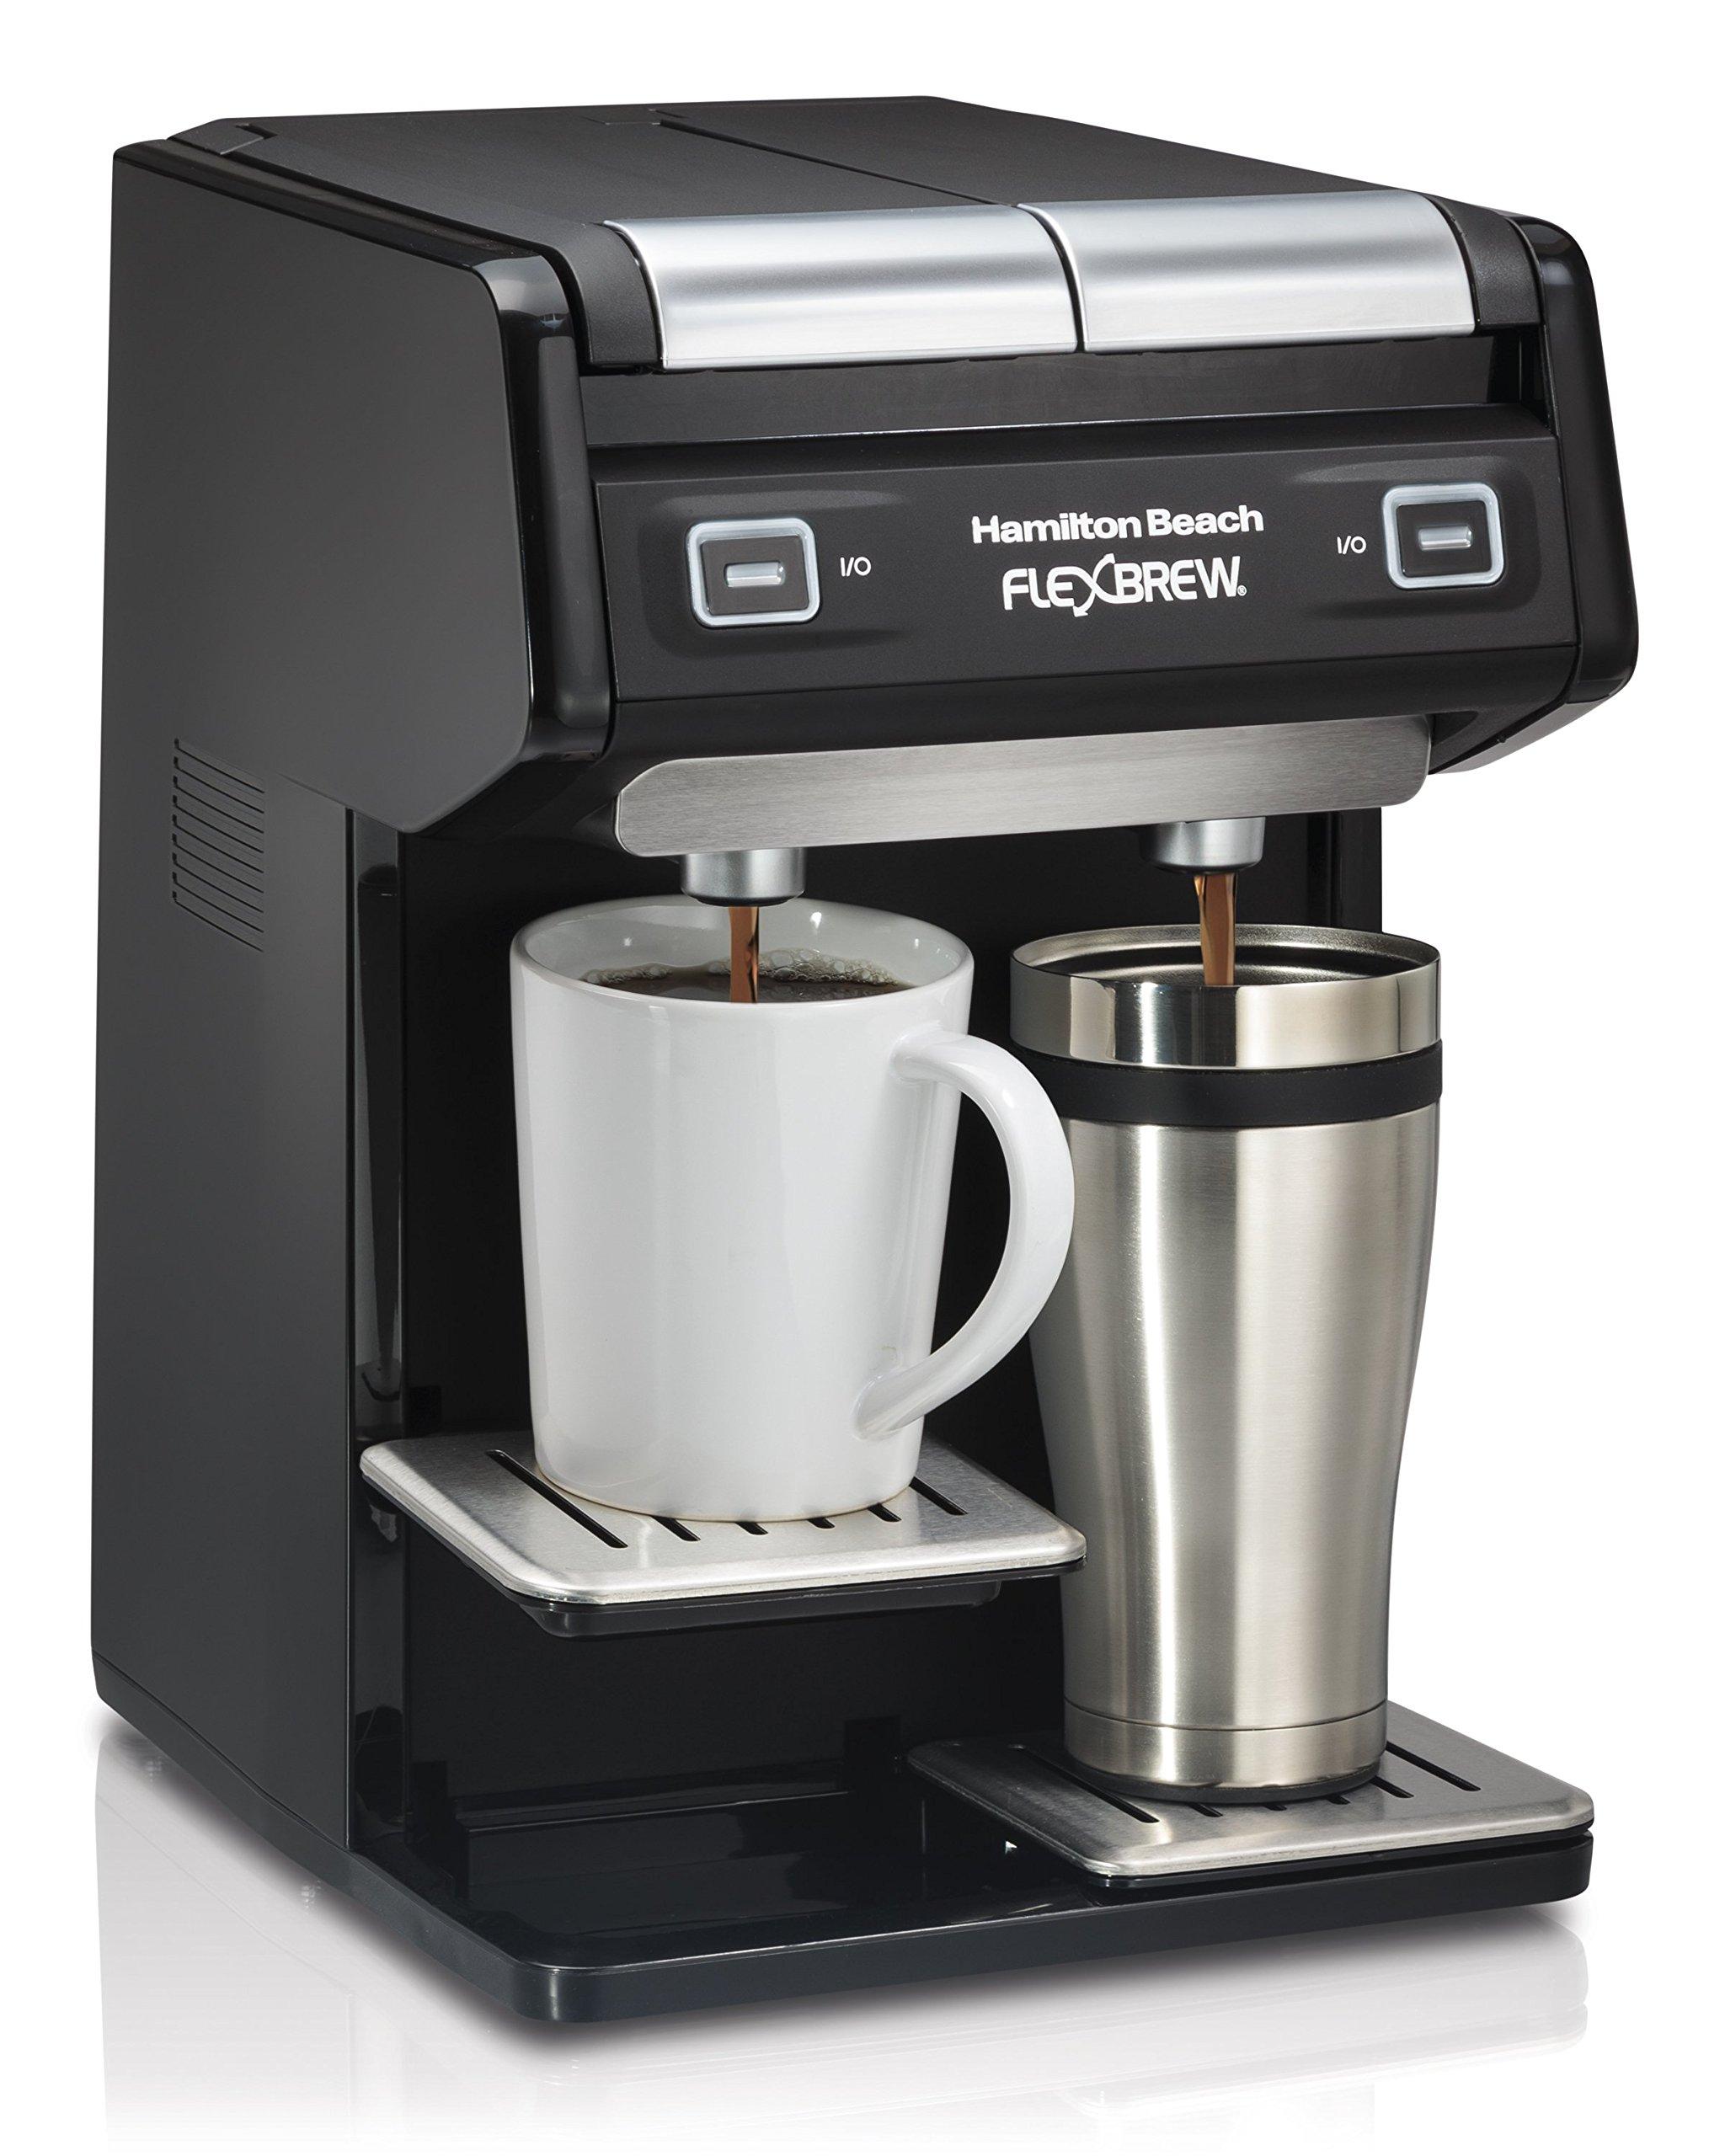 Hamilton Beach 49998 FlexBrew Dual Single Serve Coffee Maker, Black by Hamilton Beach (Image #2)